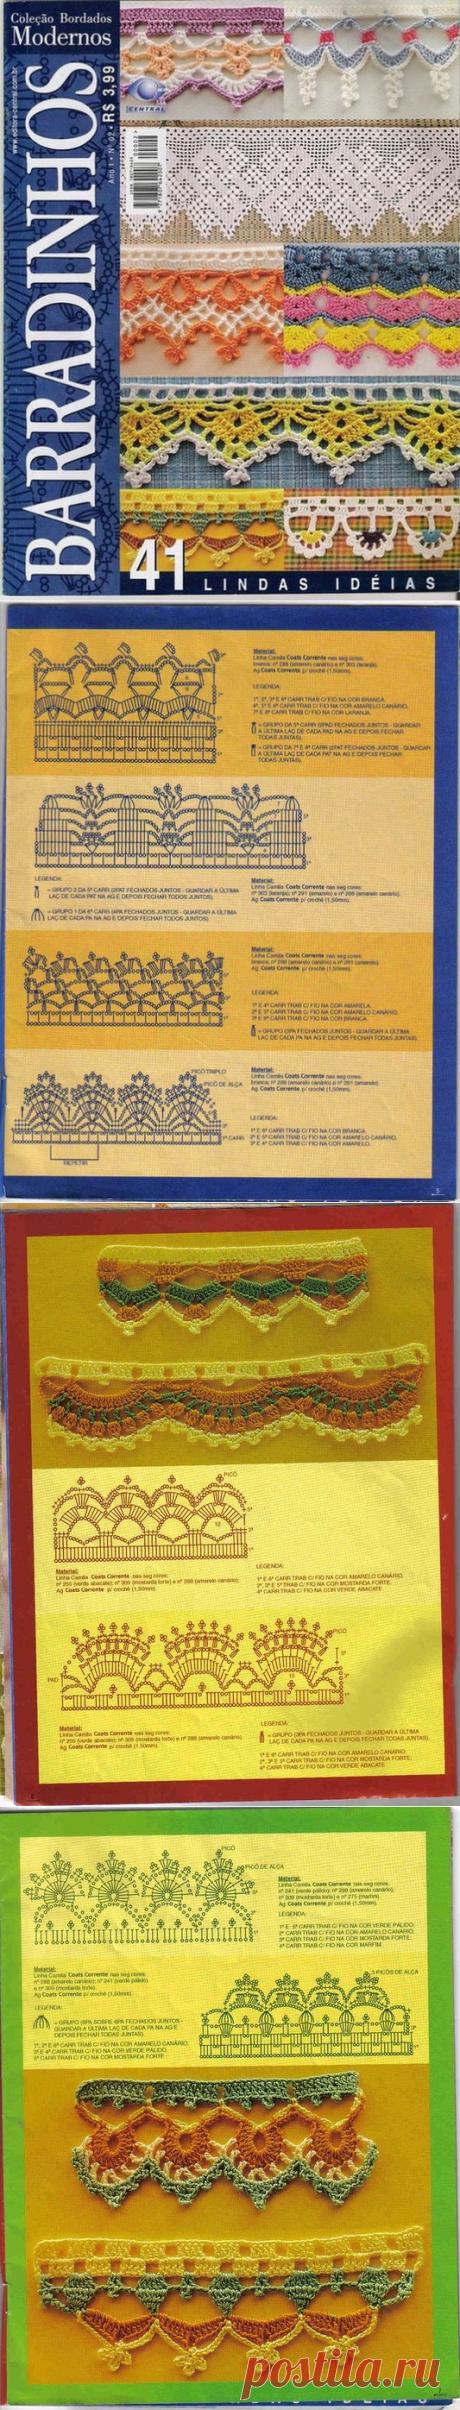 The Bordados Modernos magazine - knitting of a border